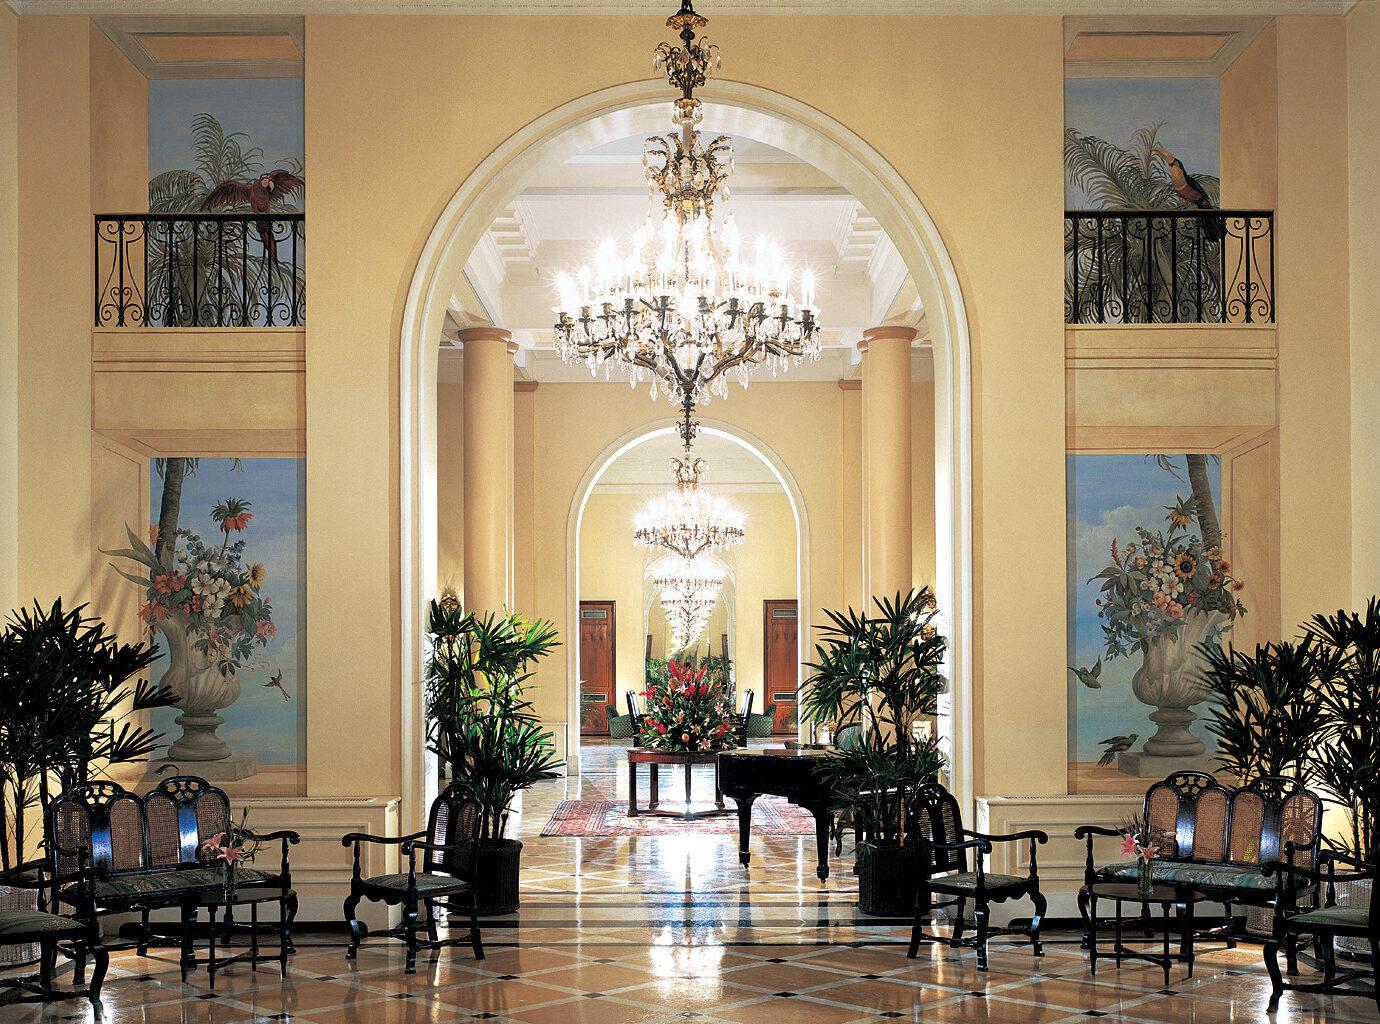 Lobby at Copacabana Palace, Rio